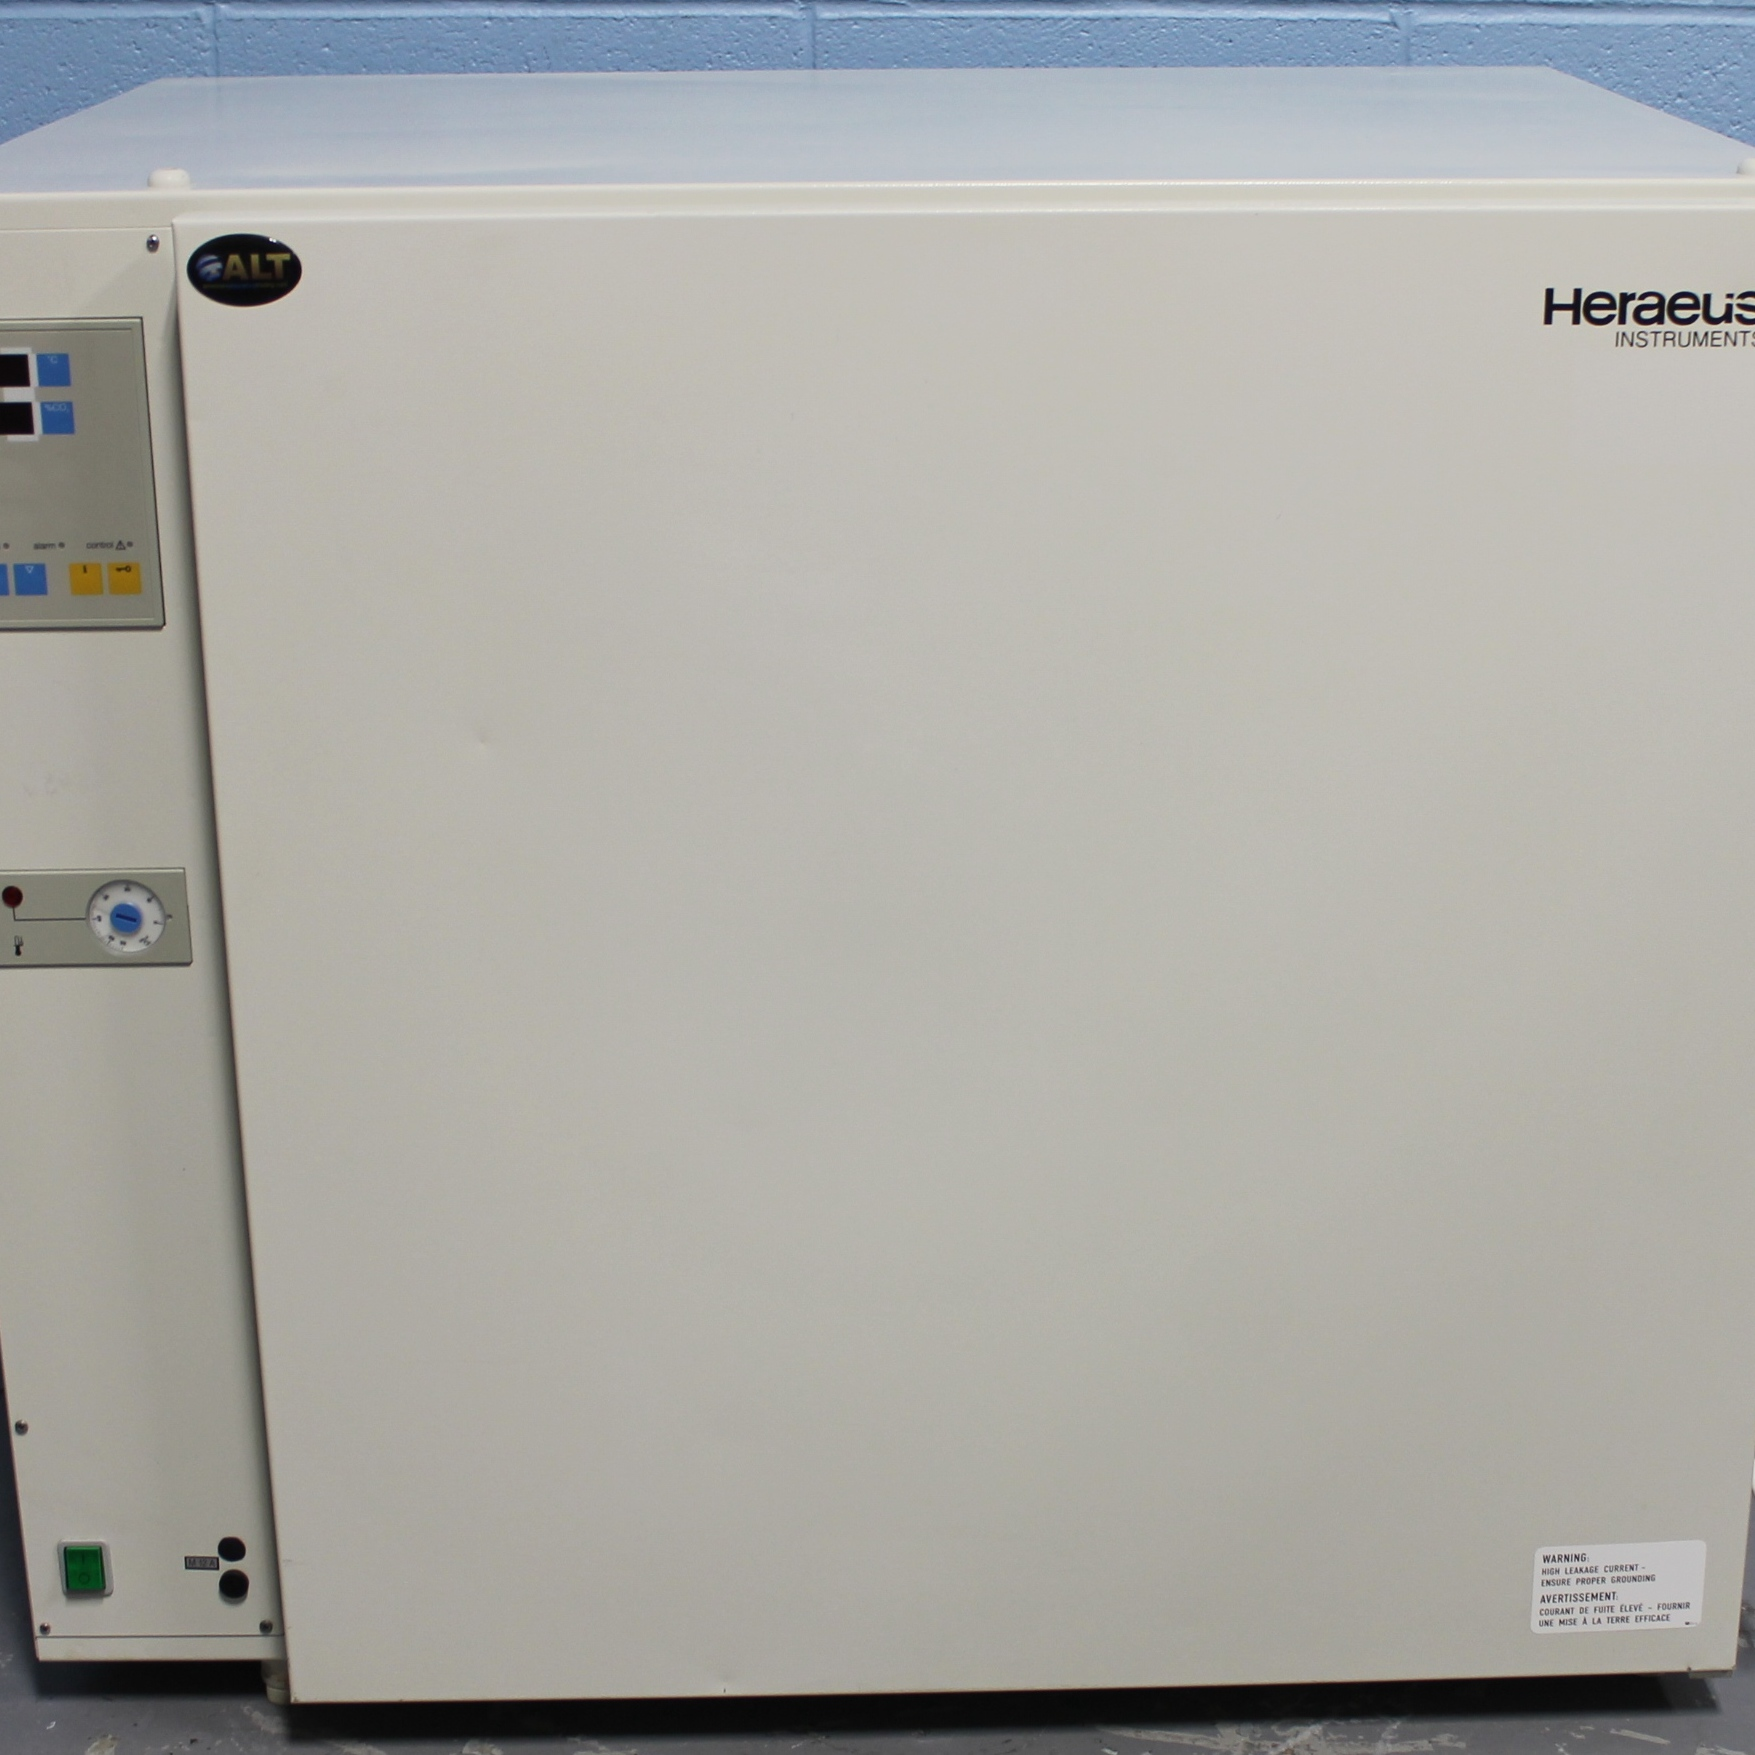 Heraeus B 5060 CO2 Incubator Image